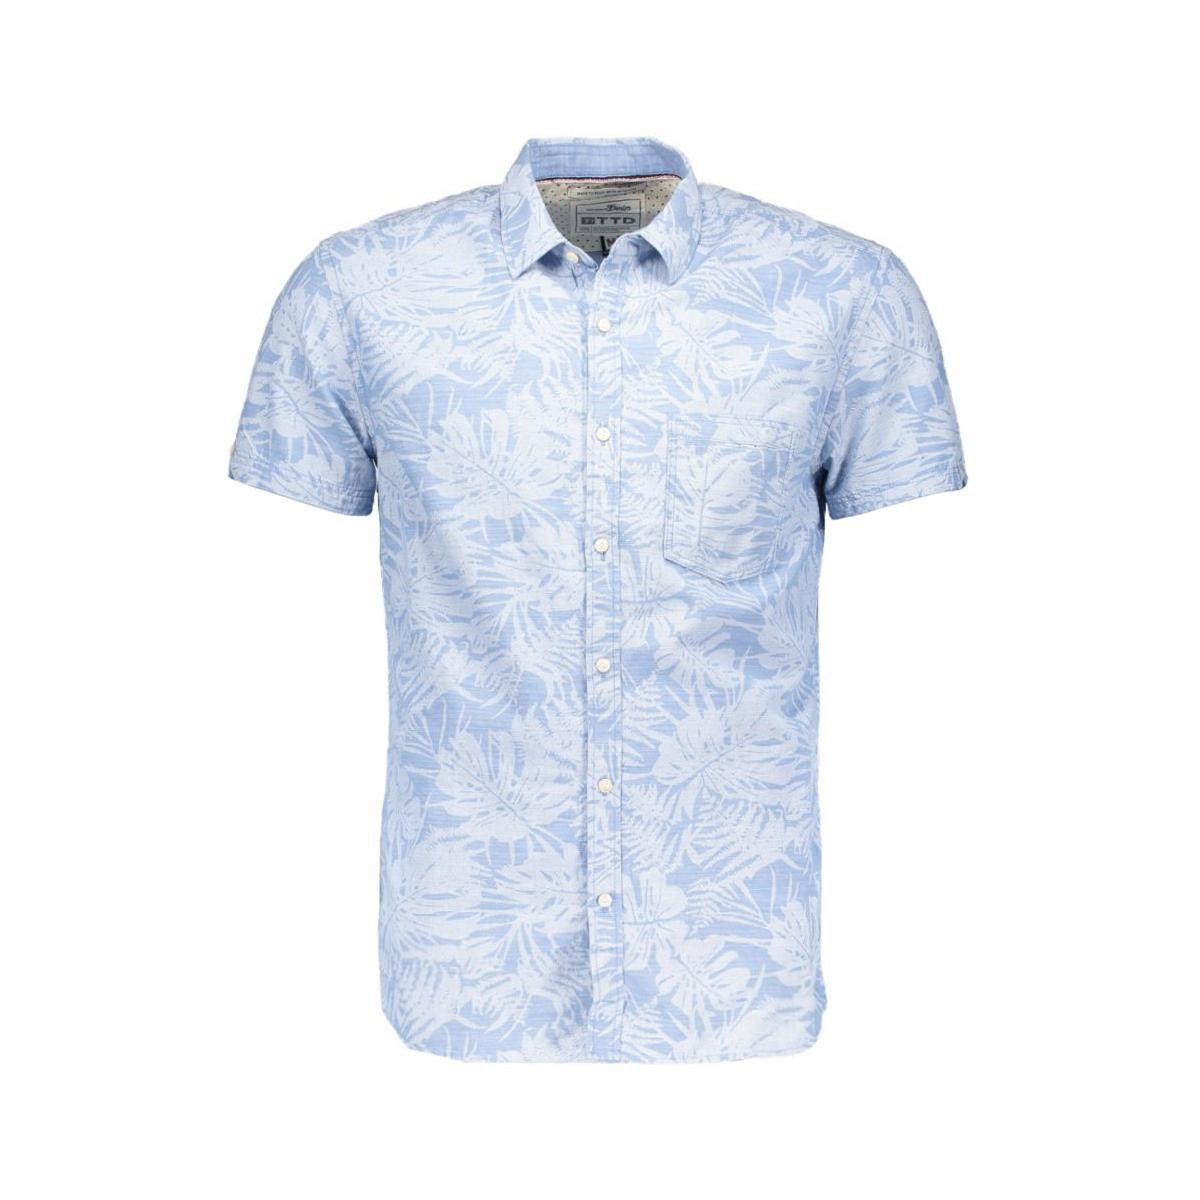 2031963.62.12 tom tailor overhemd 6692